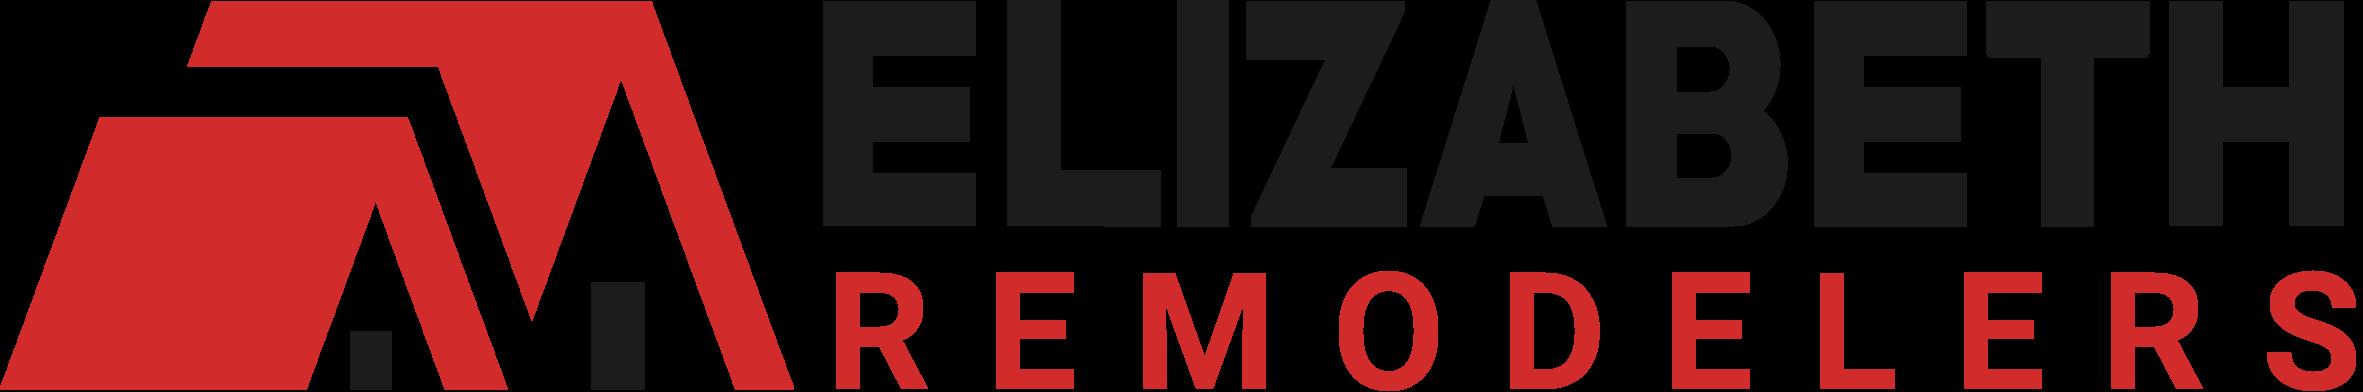 Elizabeth Remodeling Company